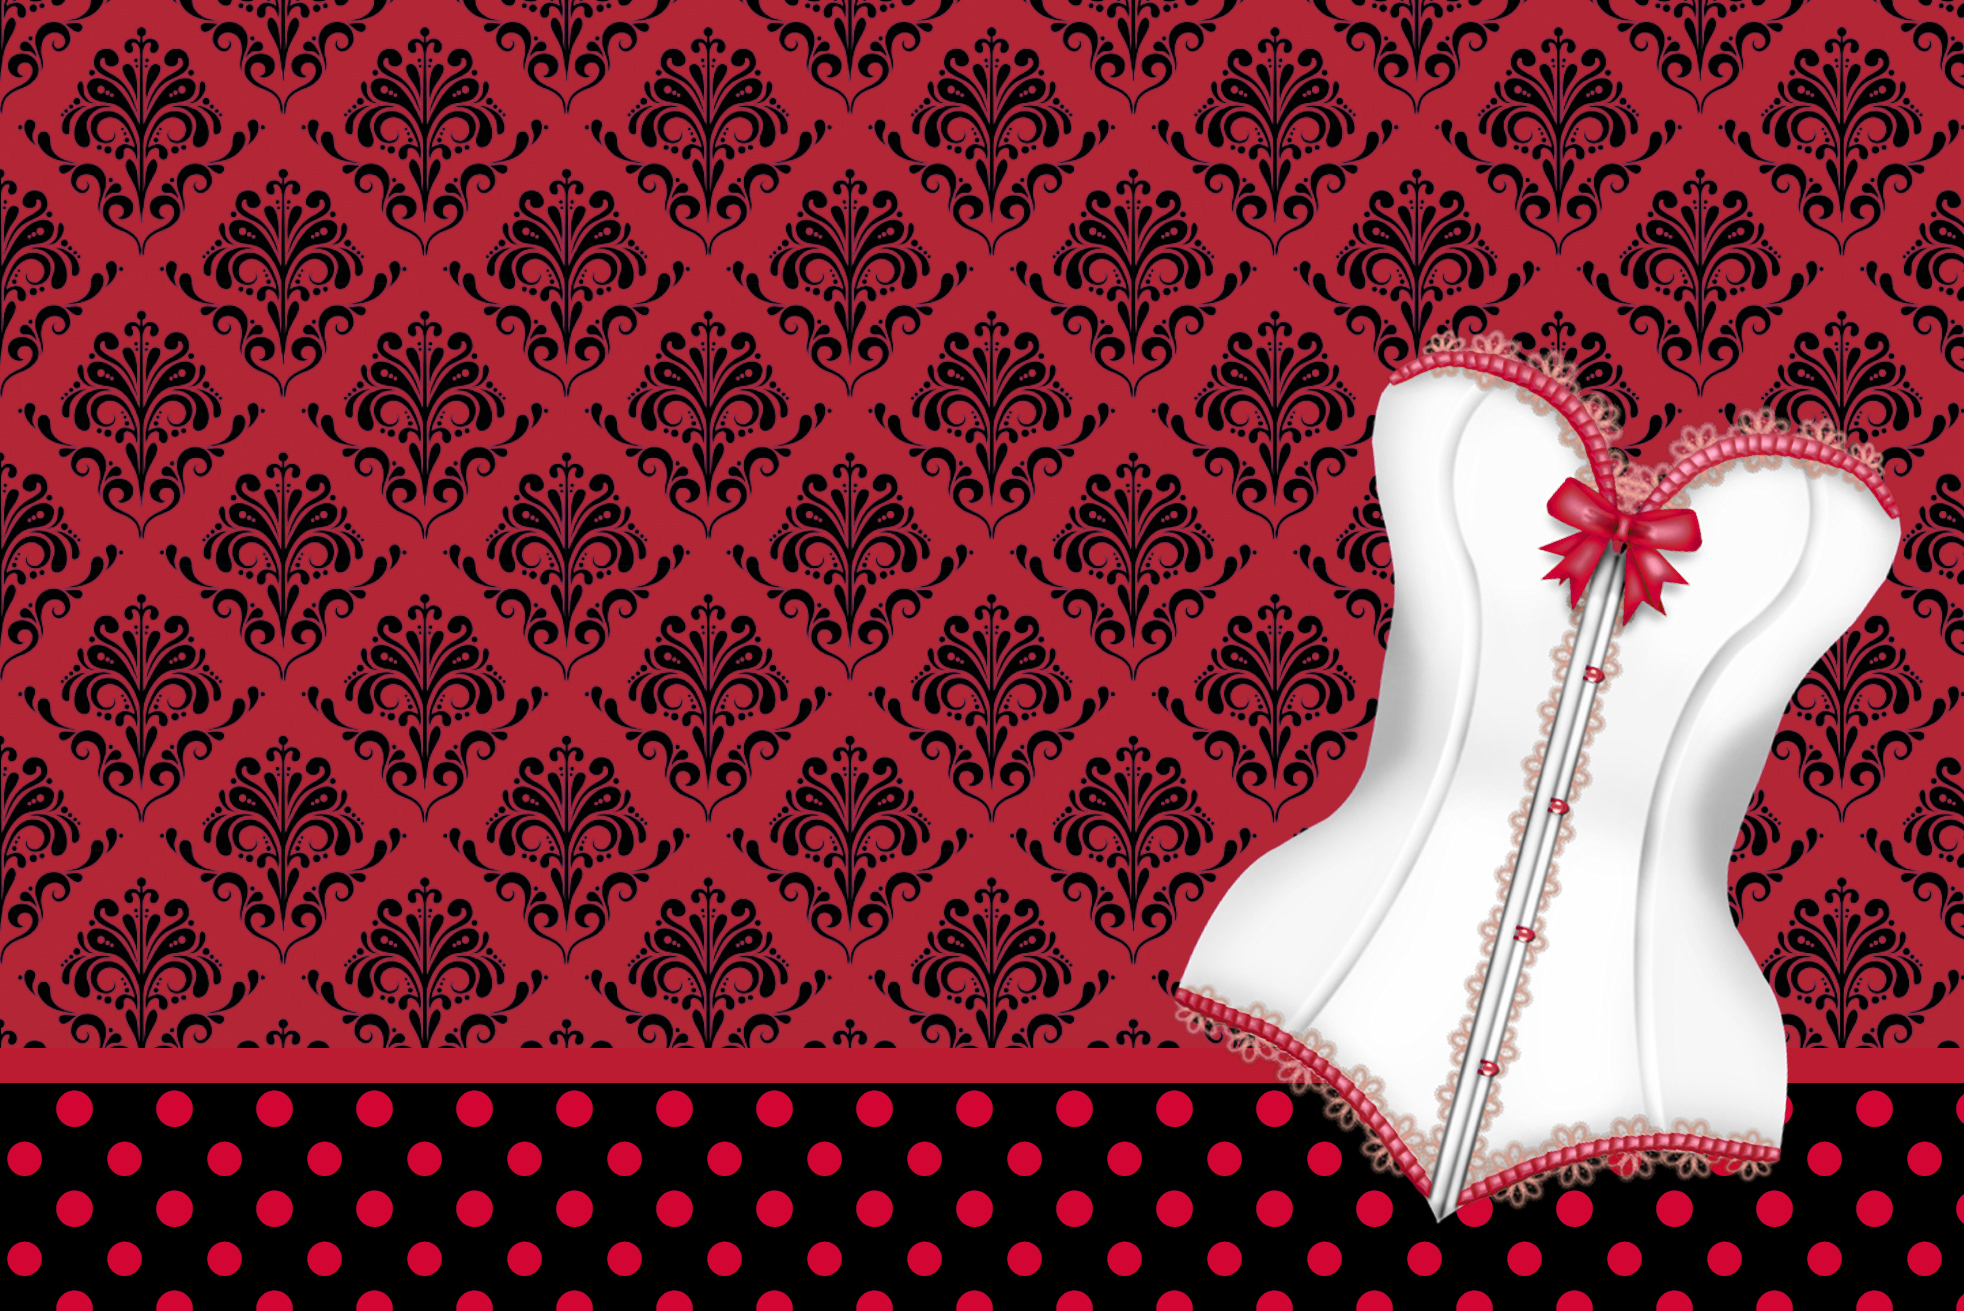 Minnie Vermelha – Kit Completo de molduras para convites